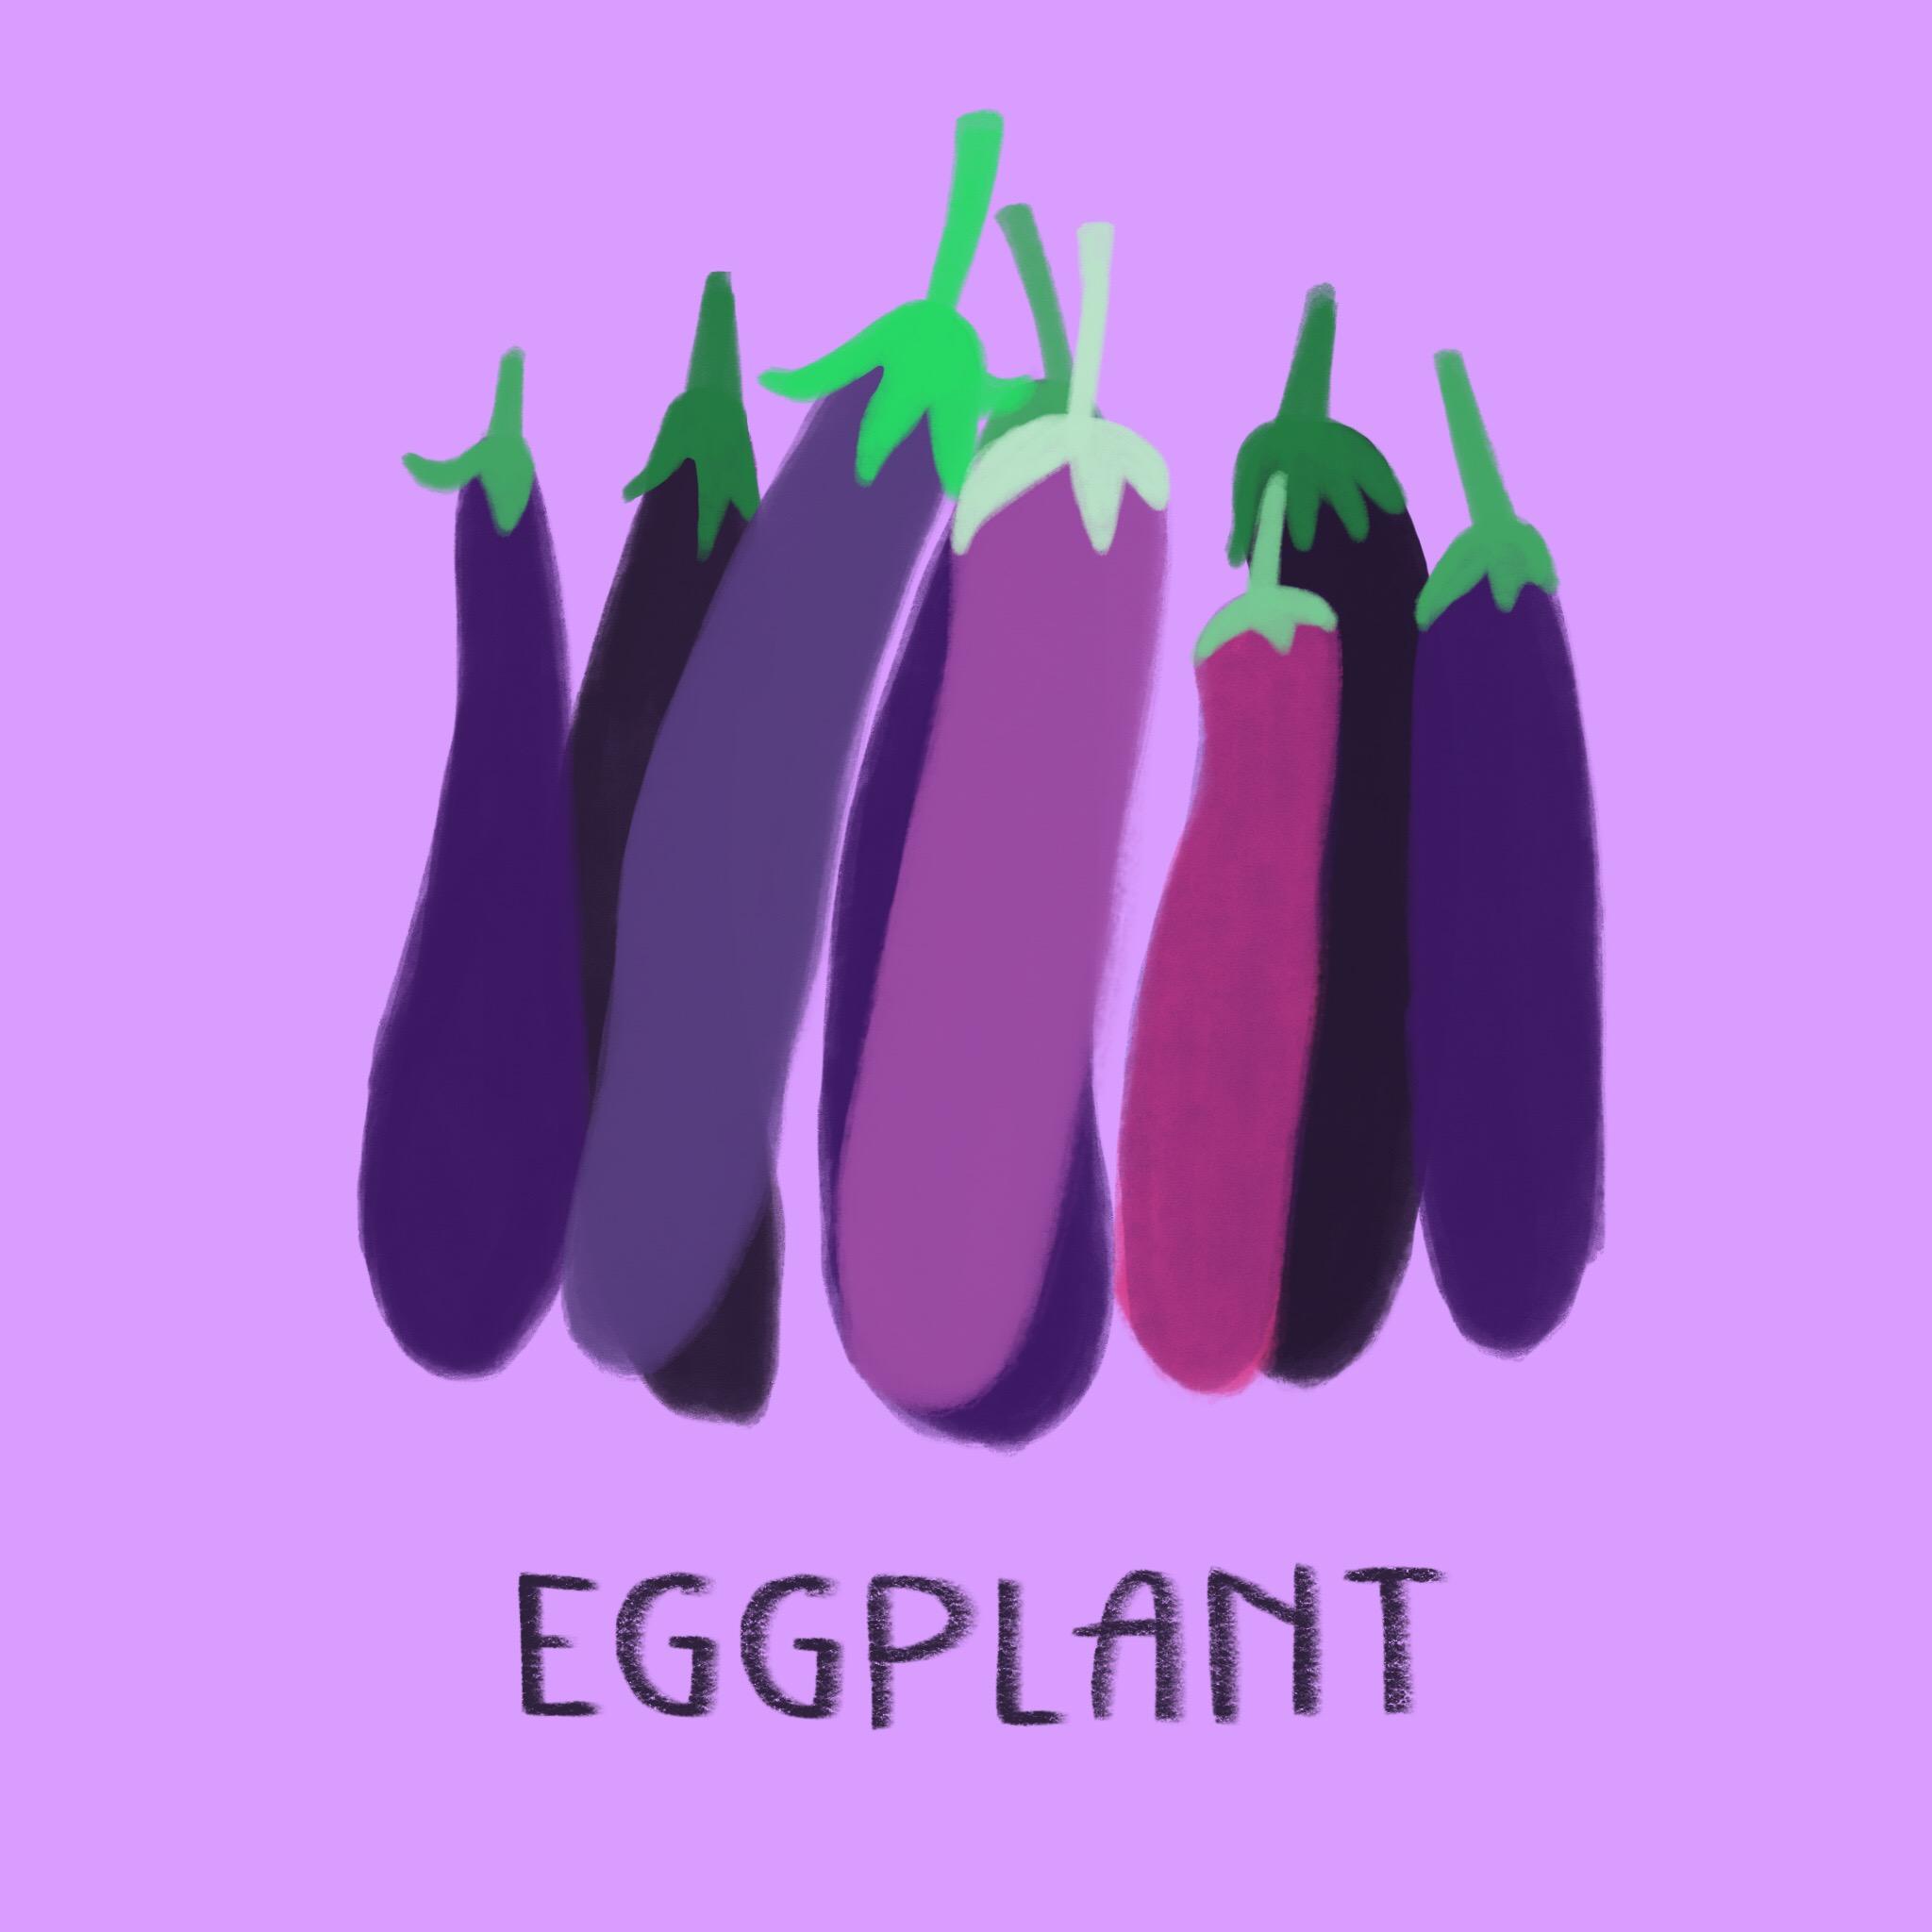 56_-_Eggplant.jpg